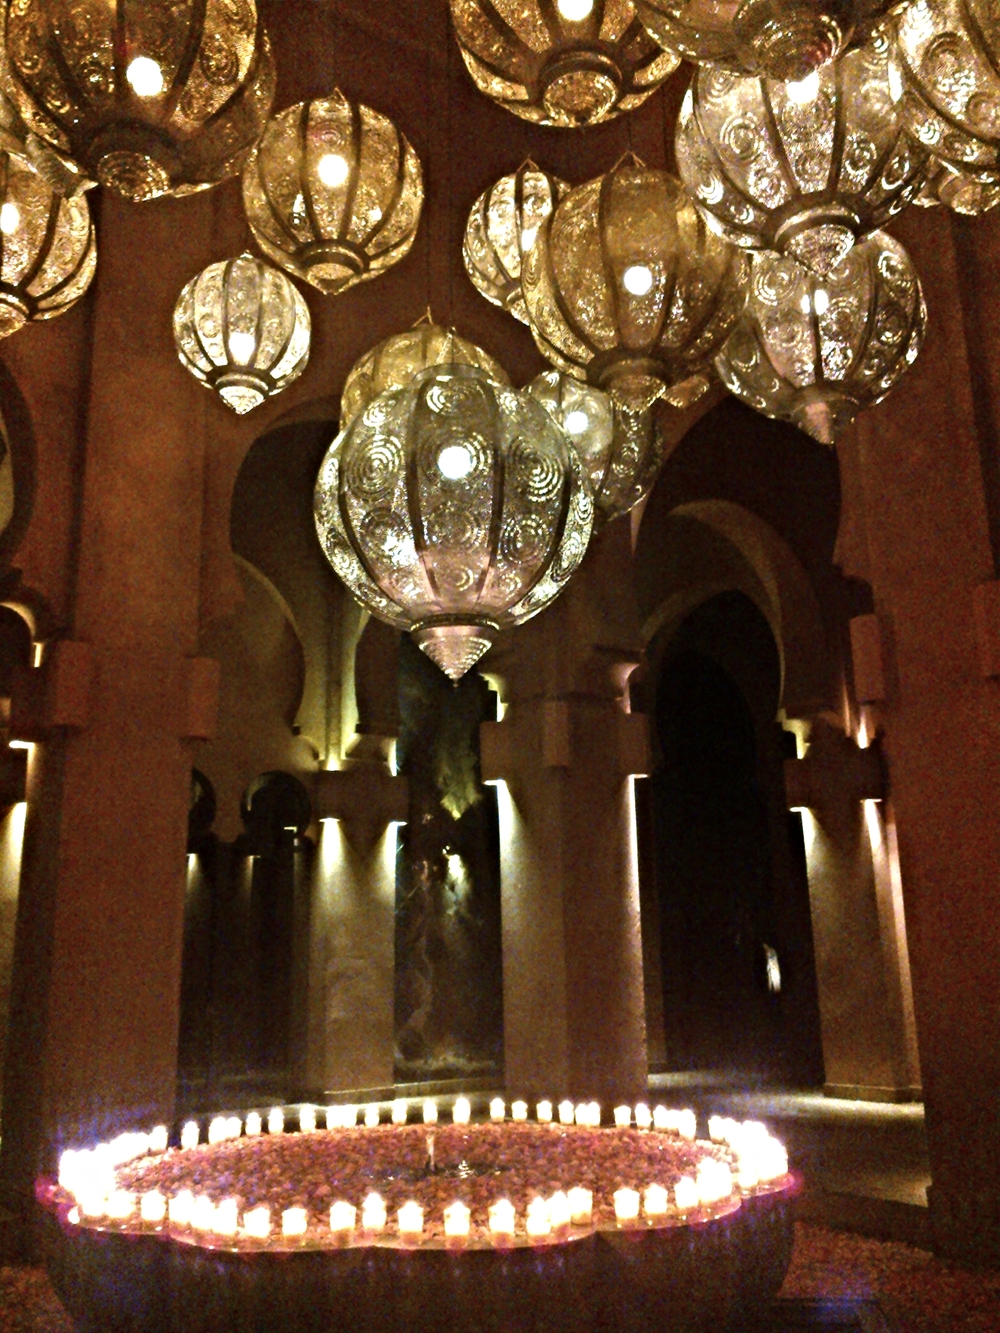 Entering the Amanjena, Marrakech